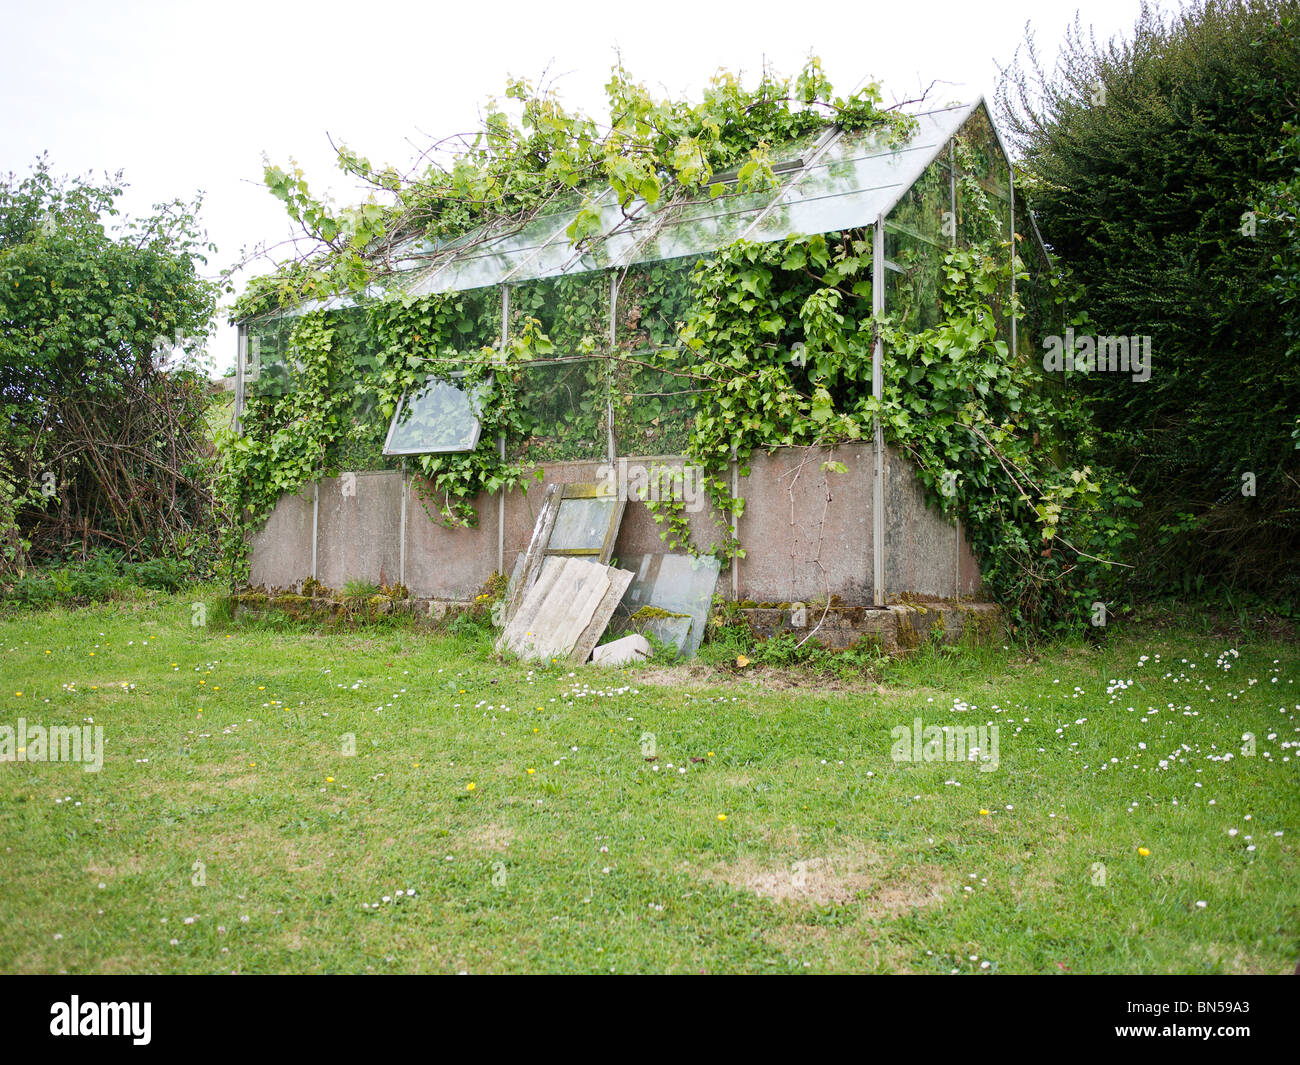 Overgrown greenhouse - Stock Image